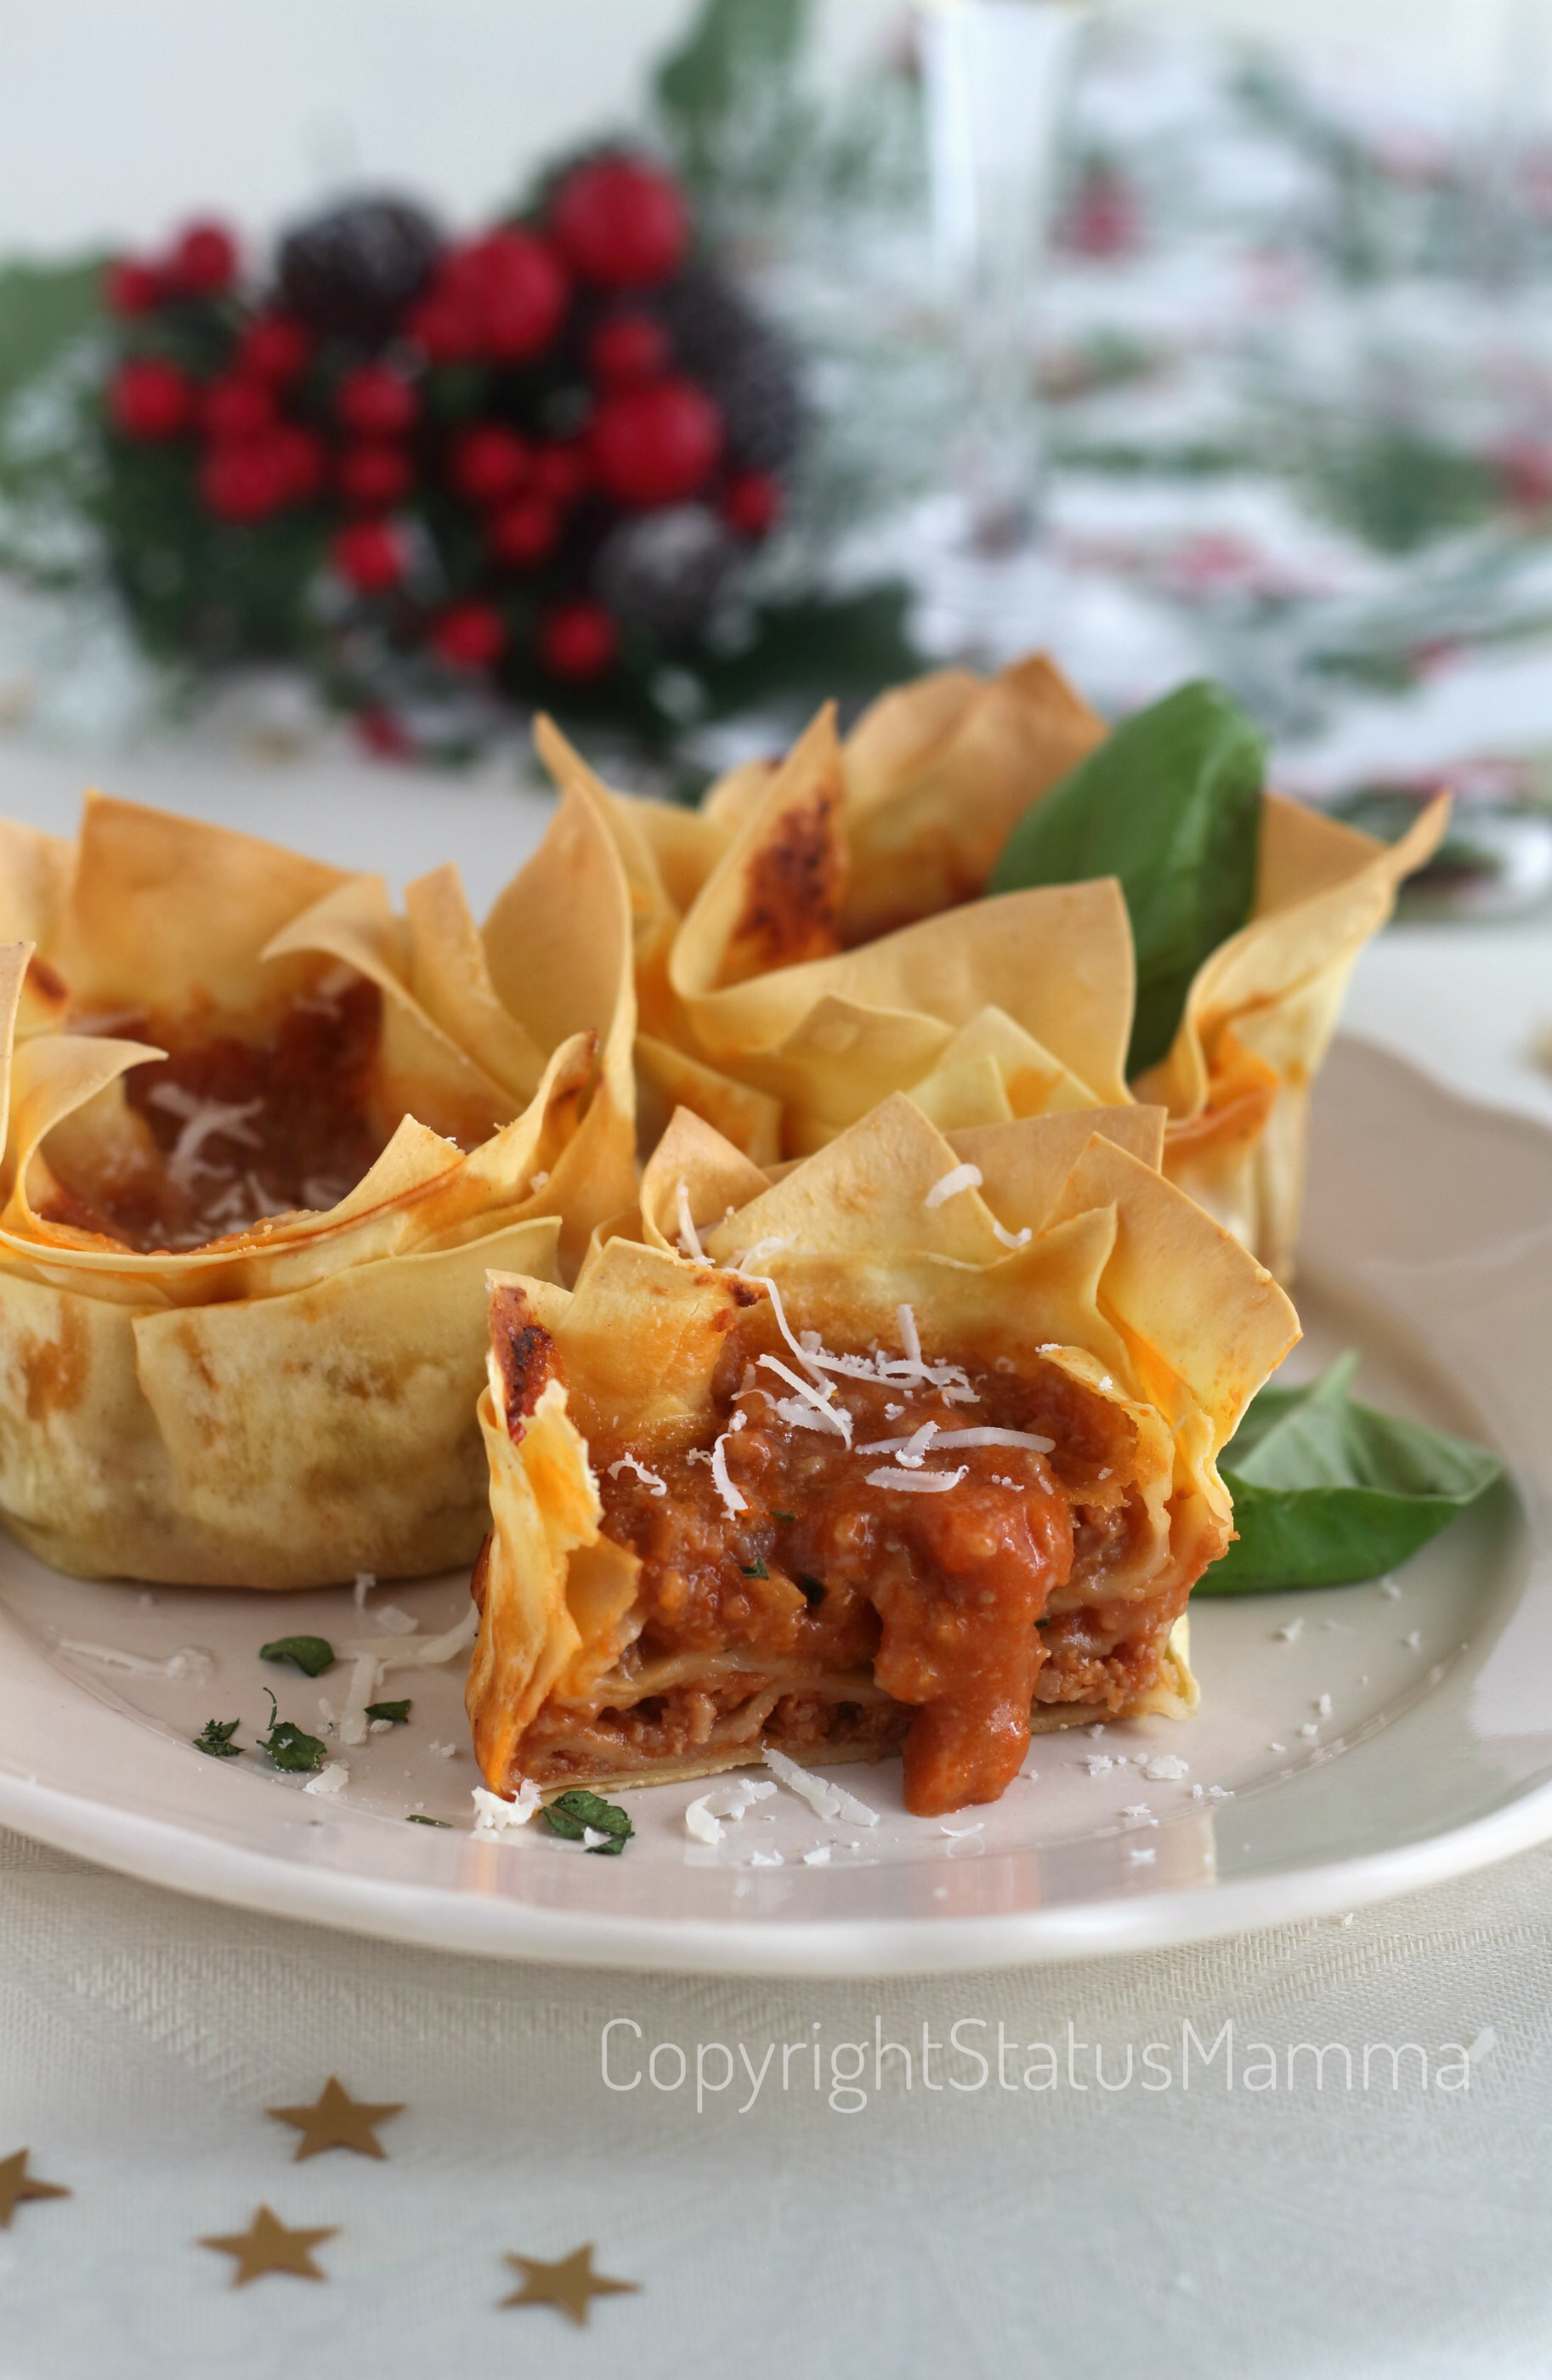 Lasagnette al ragù